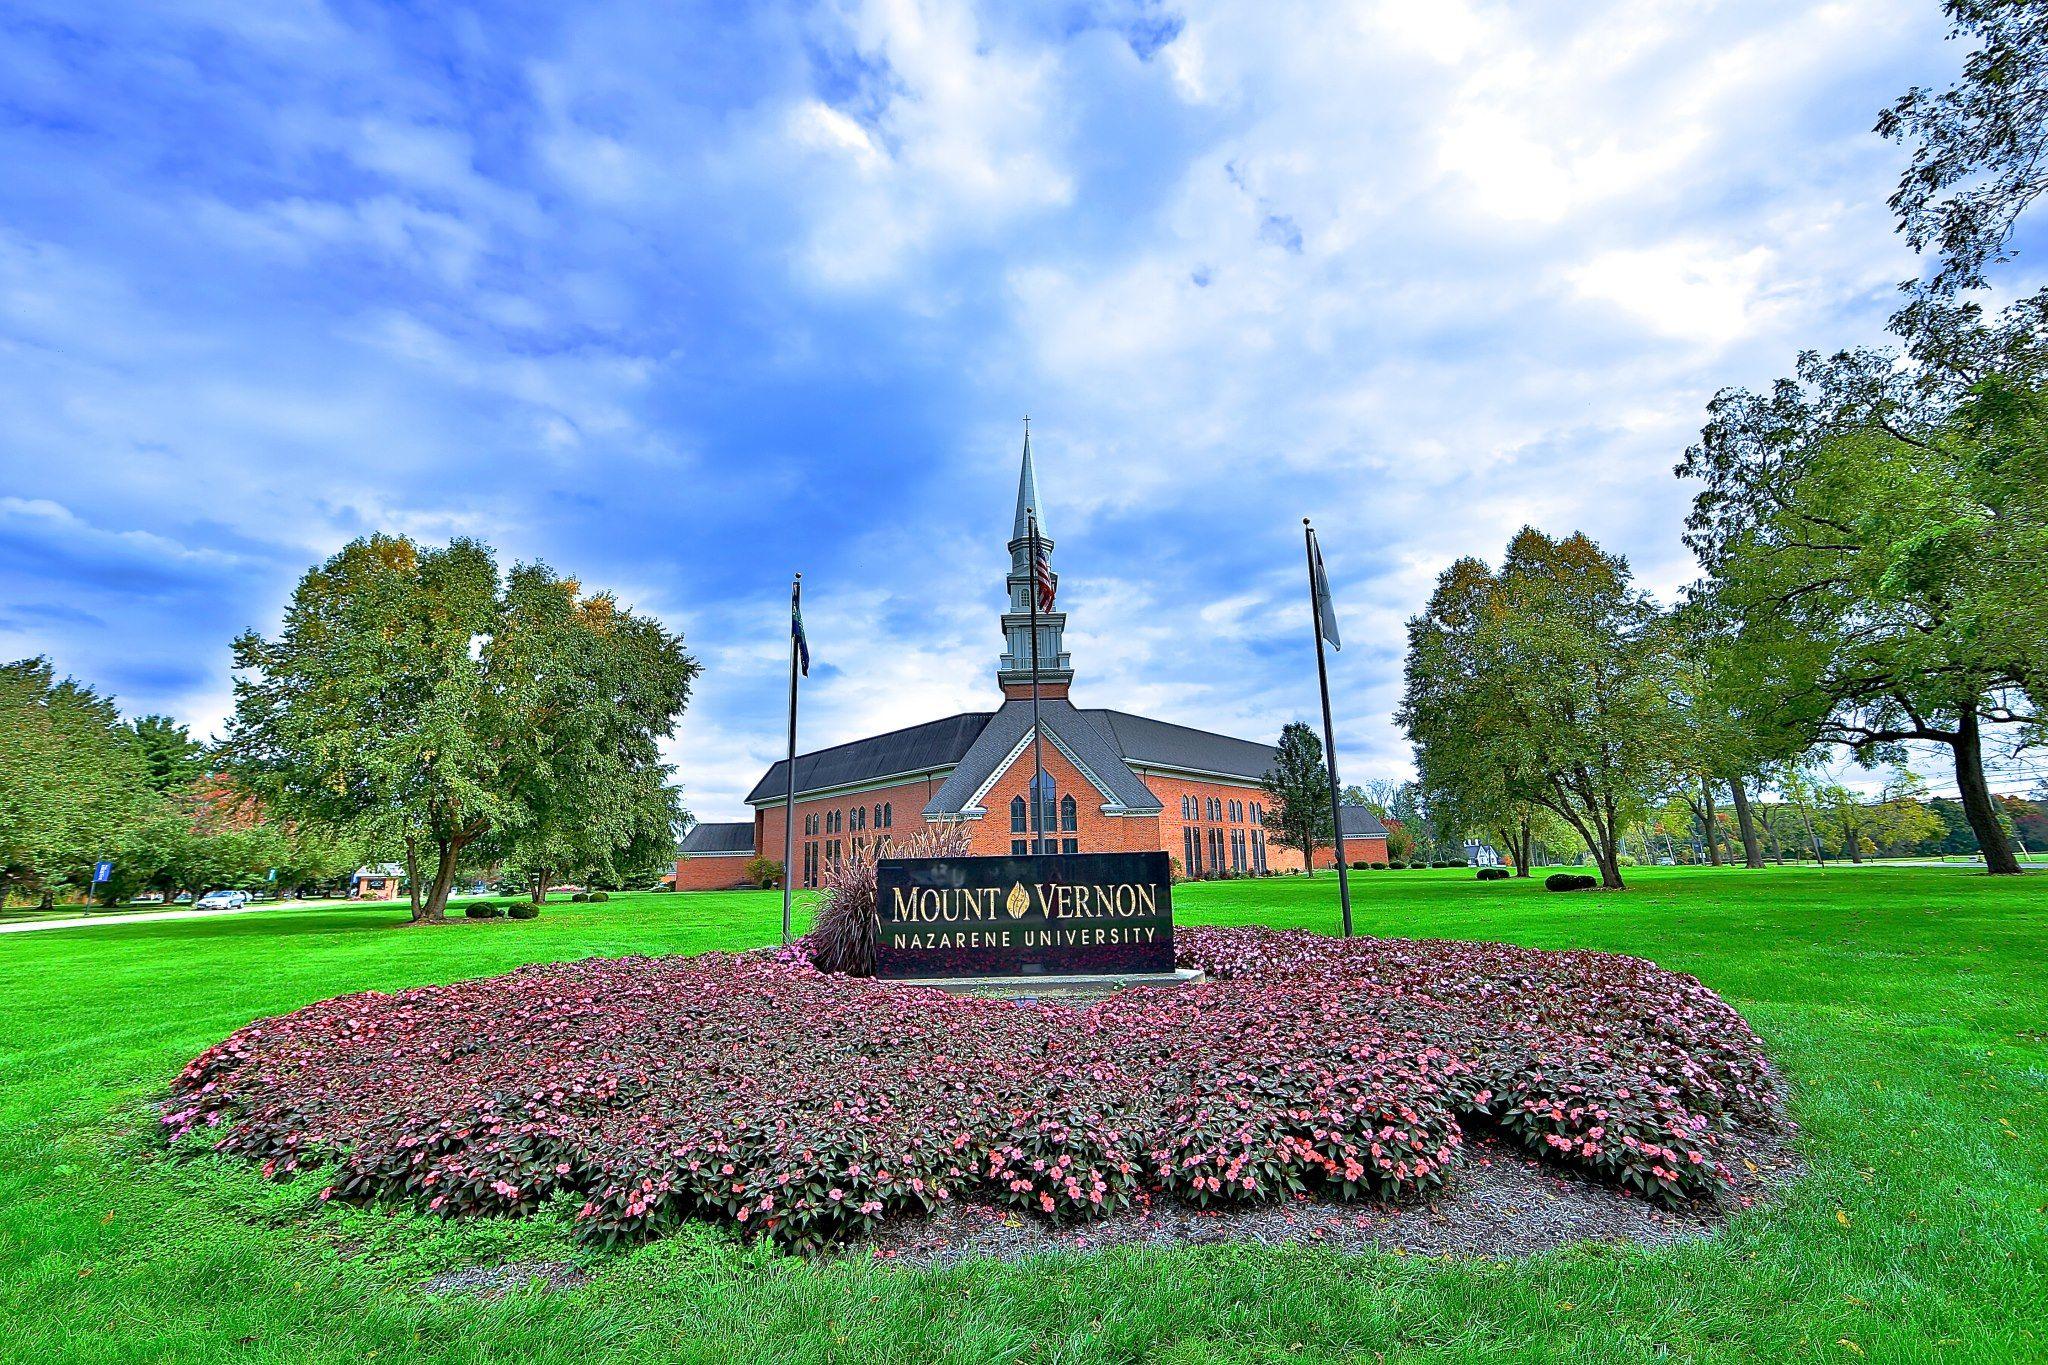 Mount Vernon Nazarene University >> Mount Vernon Nazarene University Photo By Sam Miller The